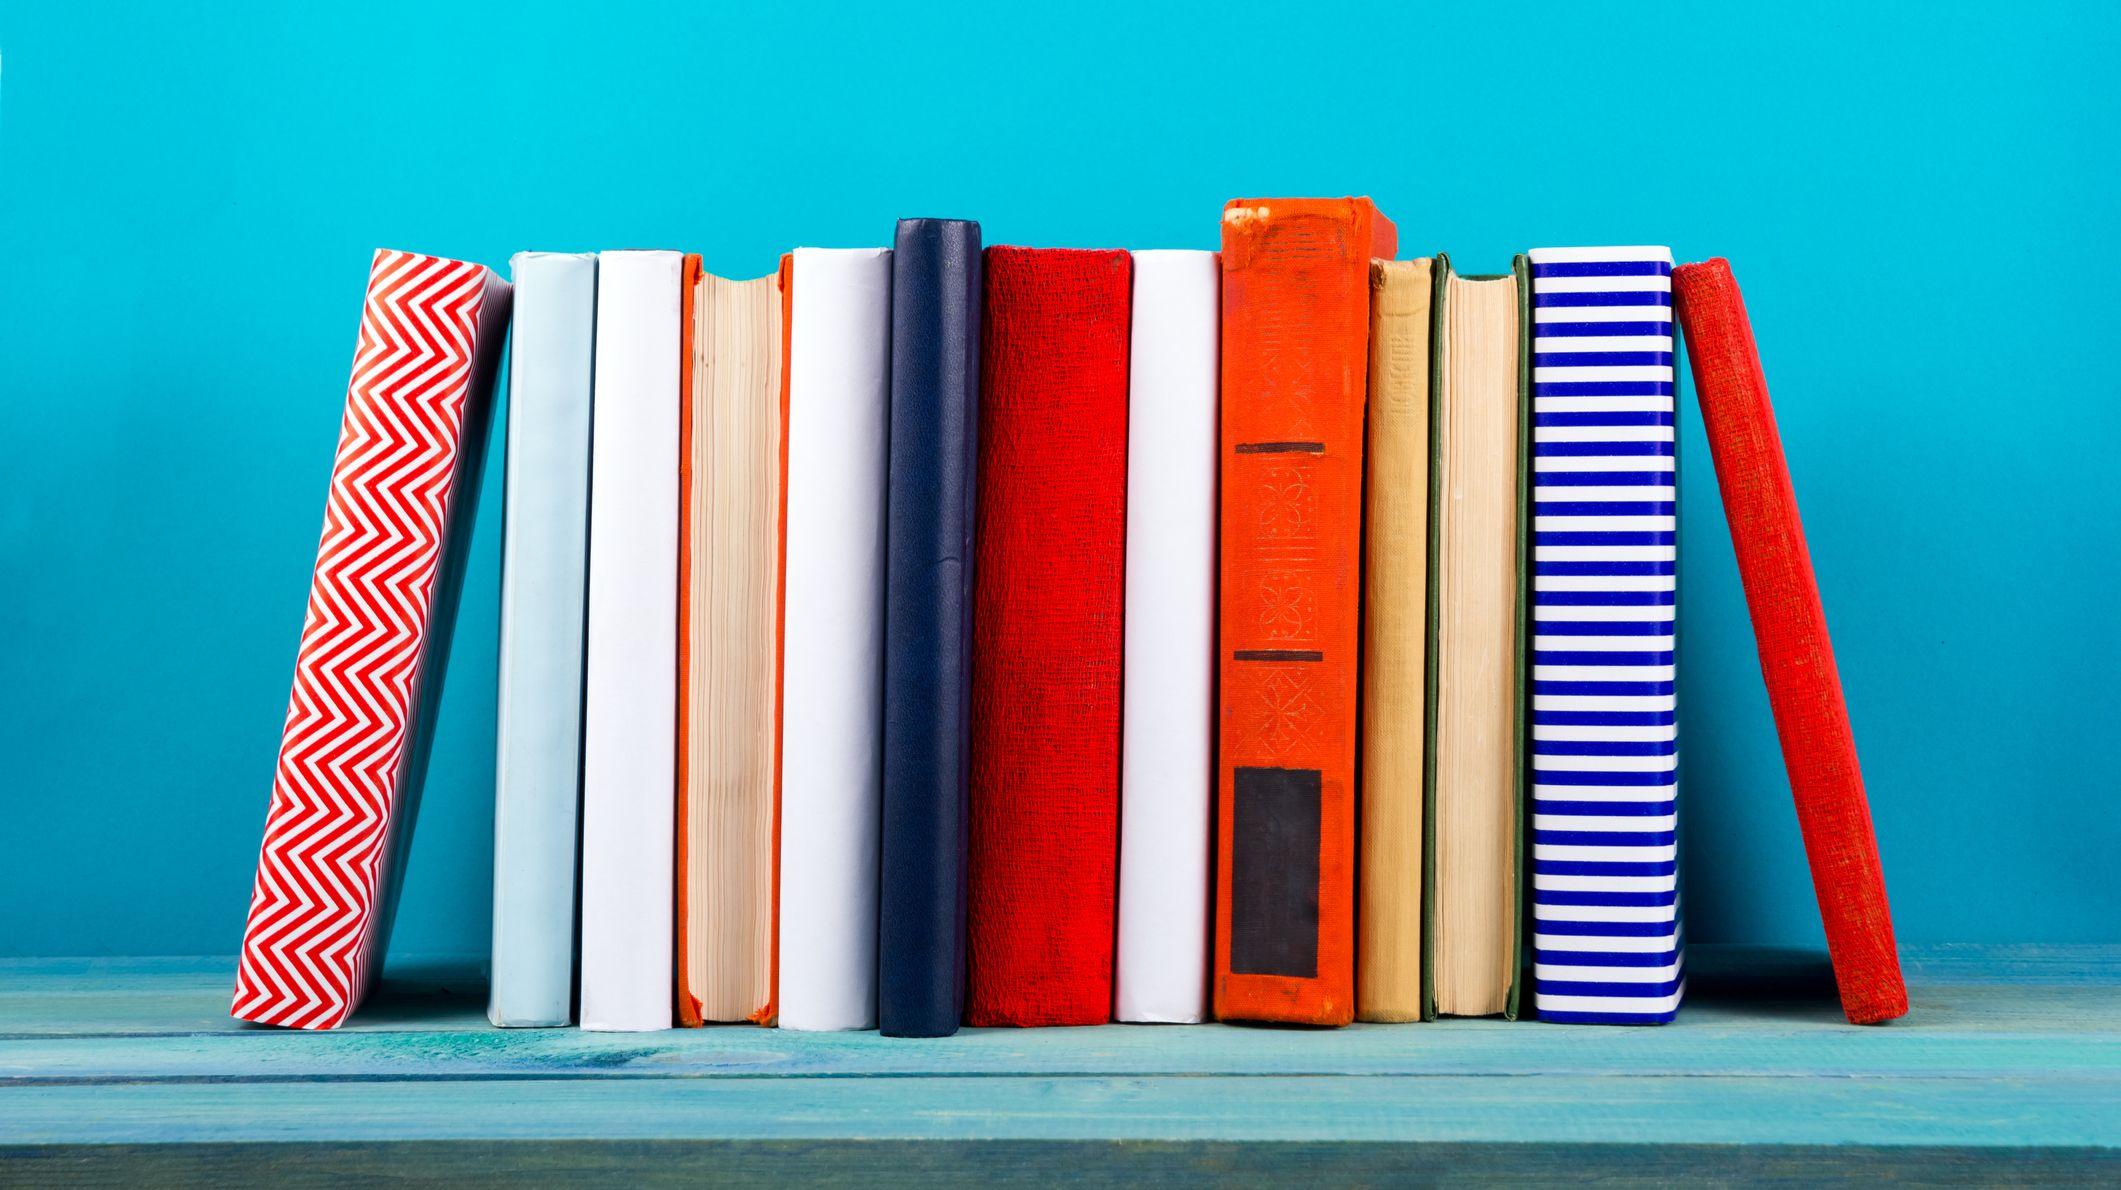 Announcing The Mental Floss Book Club Mental Floss